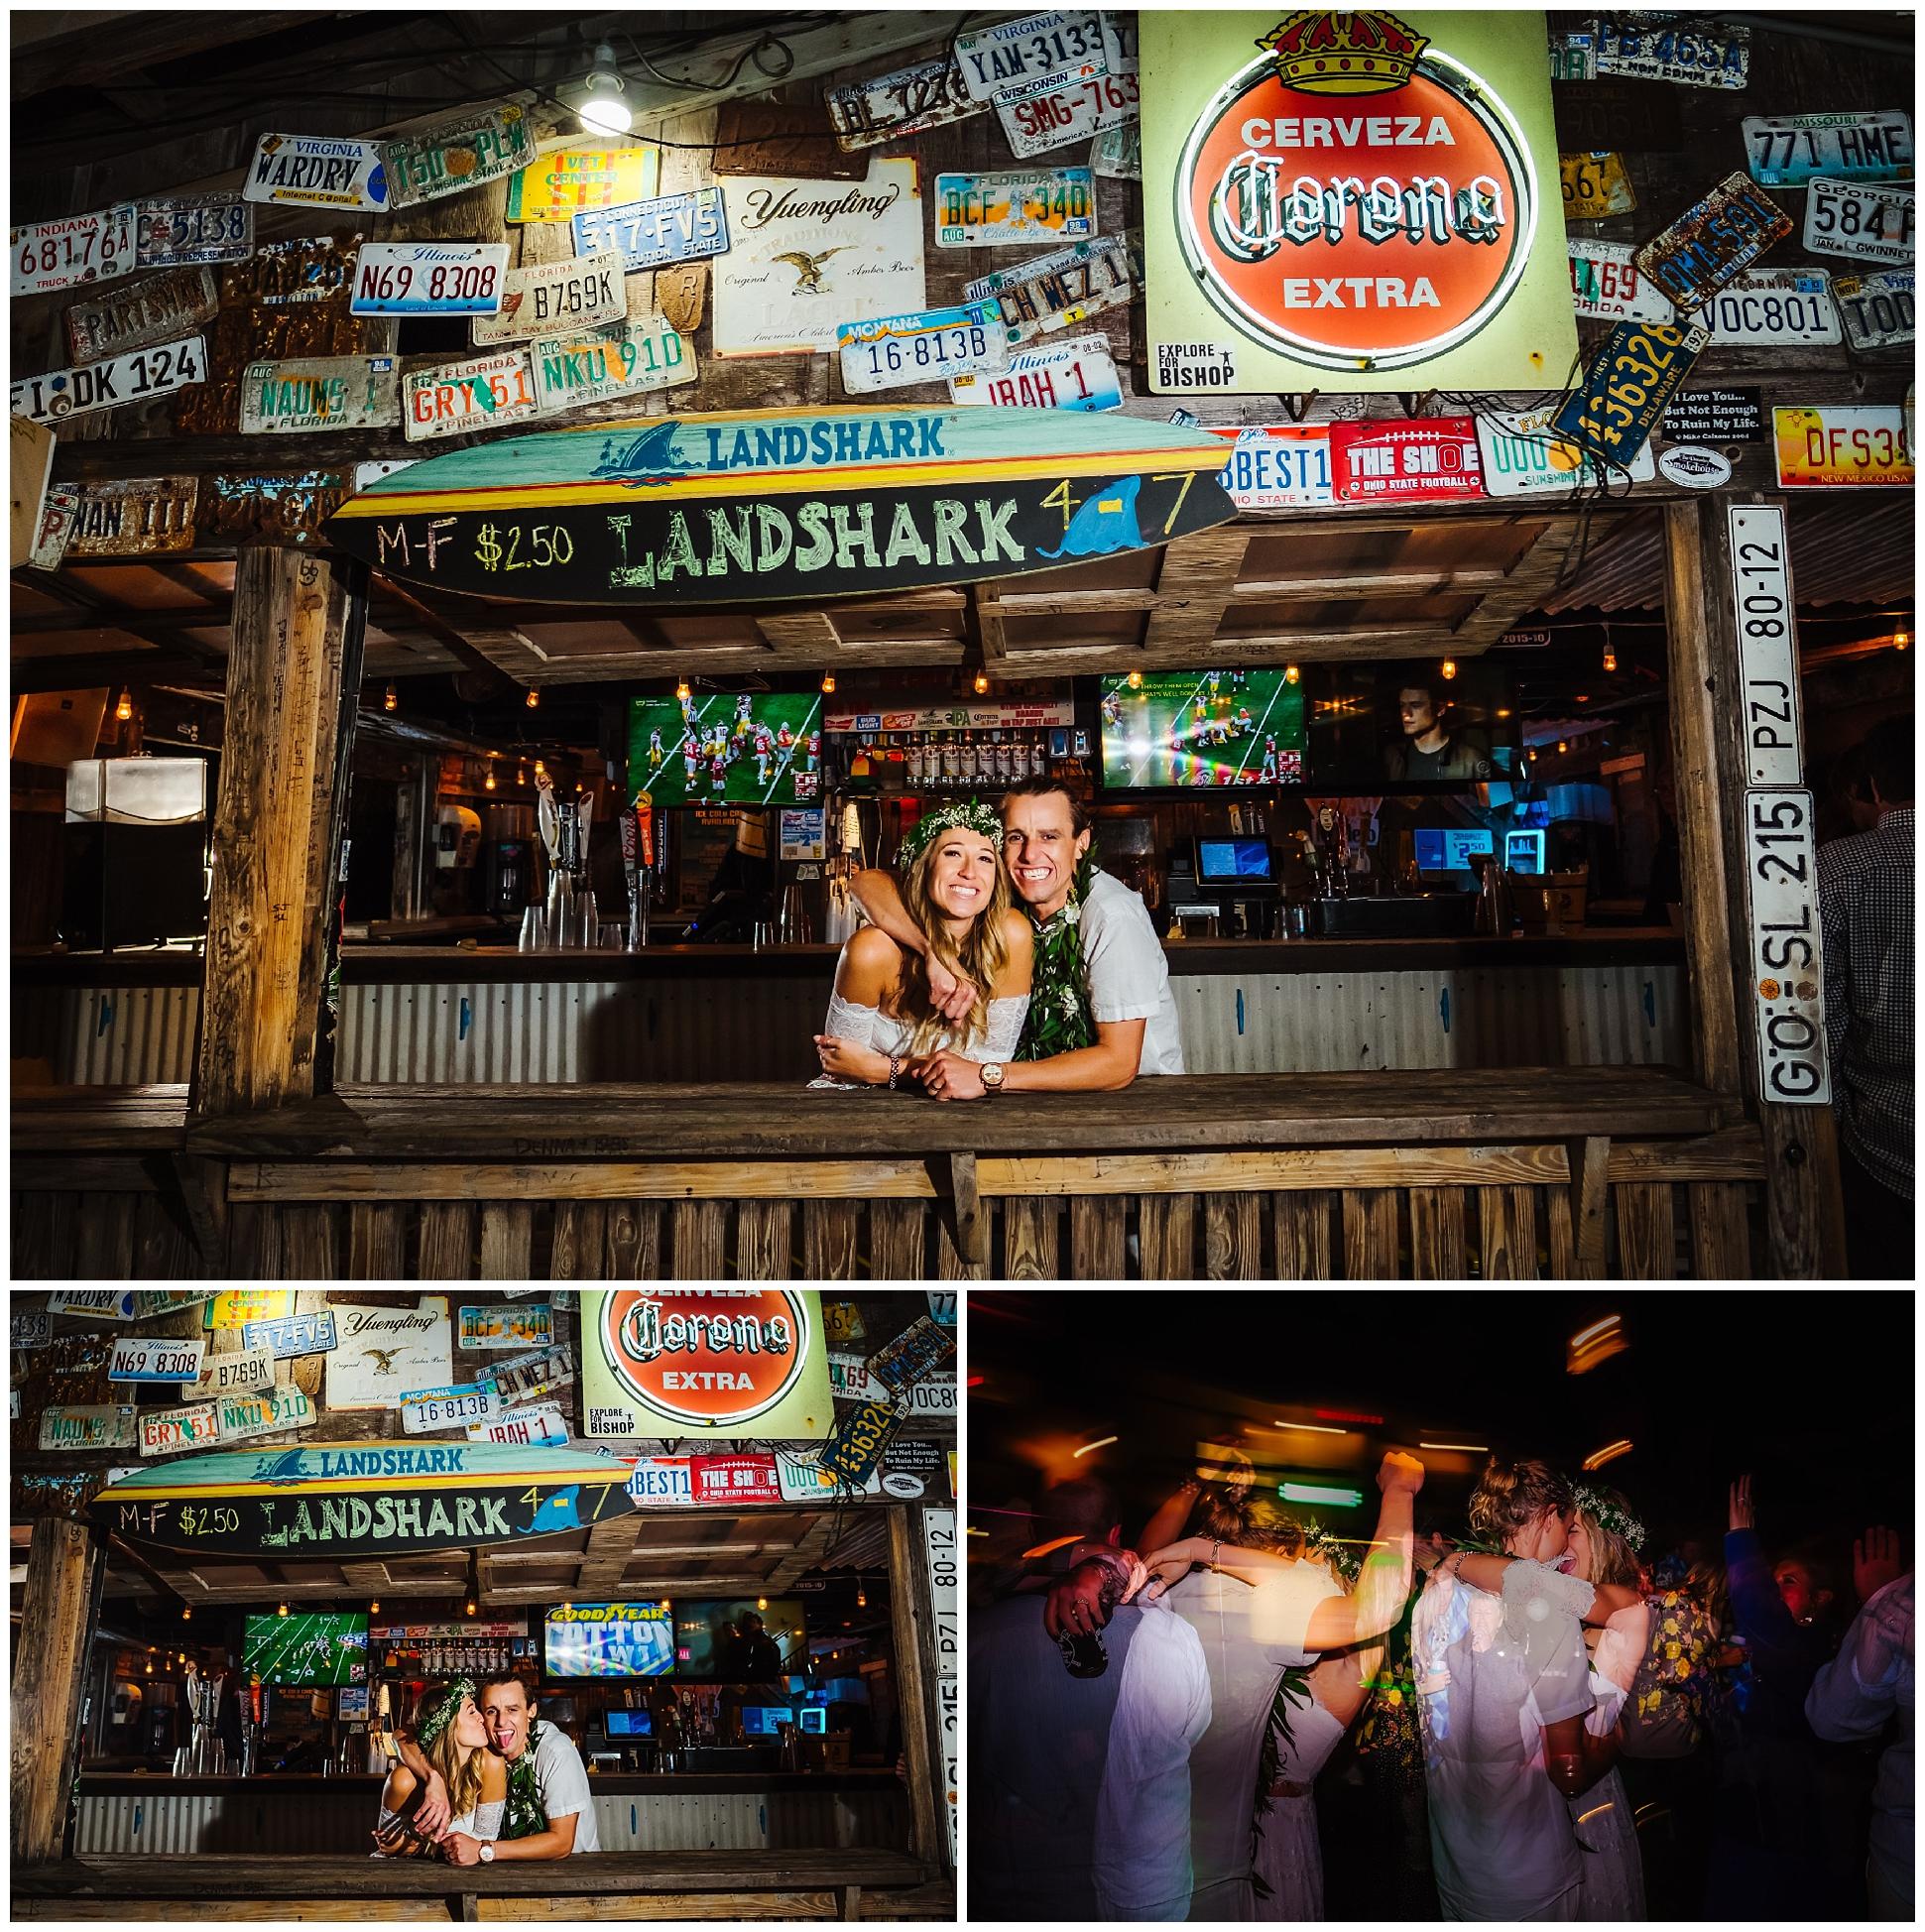 tampa-bay-wedding-photographer-barefoot-post-card-inn-tropical-hawaiin-lei-pink-pineapples-flower-crown_0211.jpg